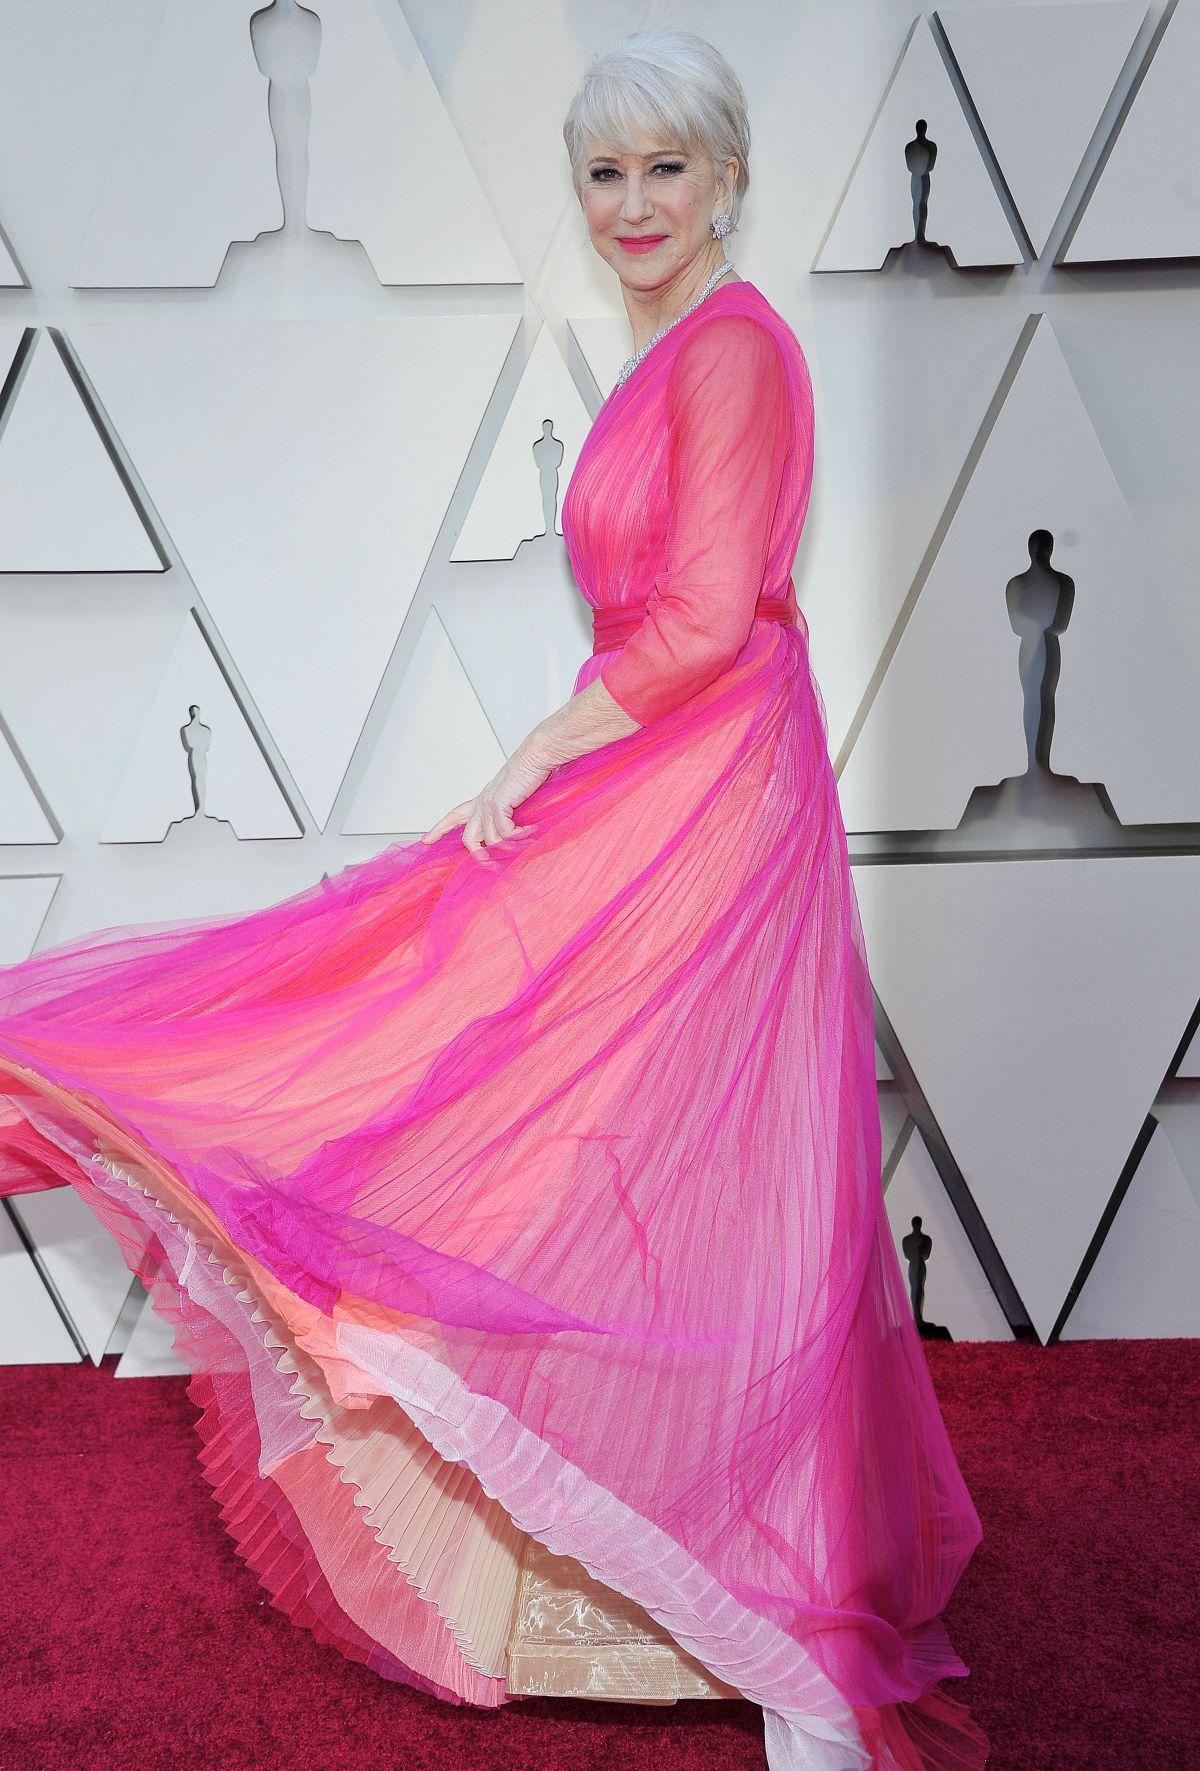 Helen Mirren At Oscars 2019 In Los Angeles 02 24 2019